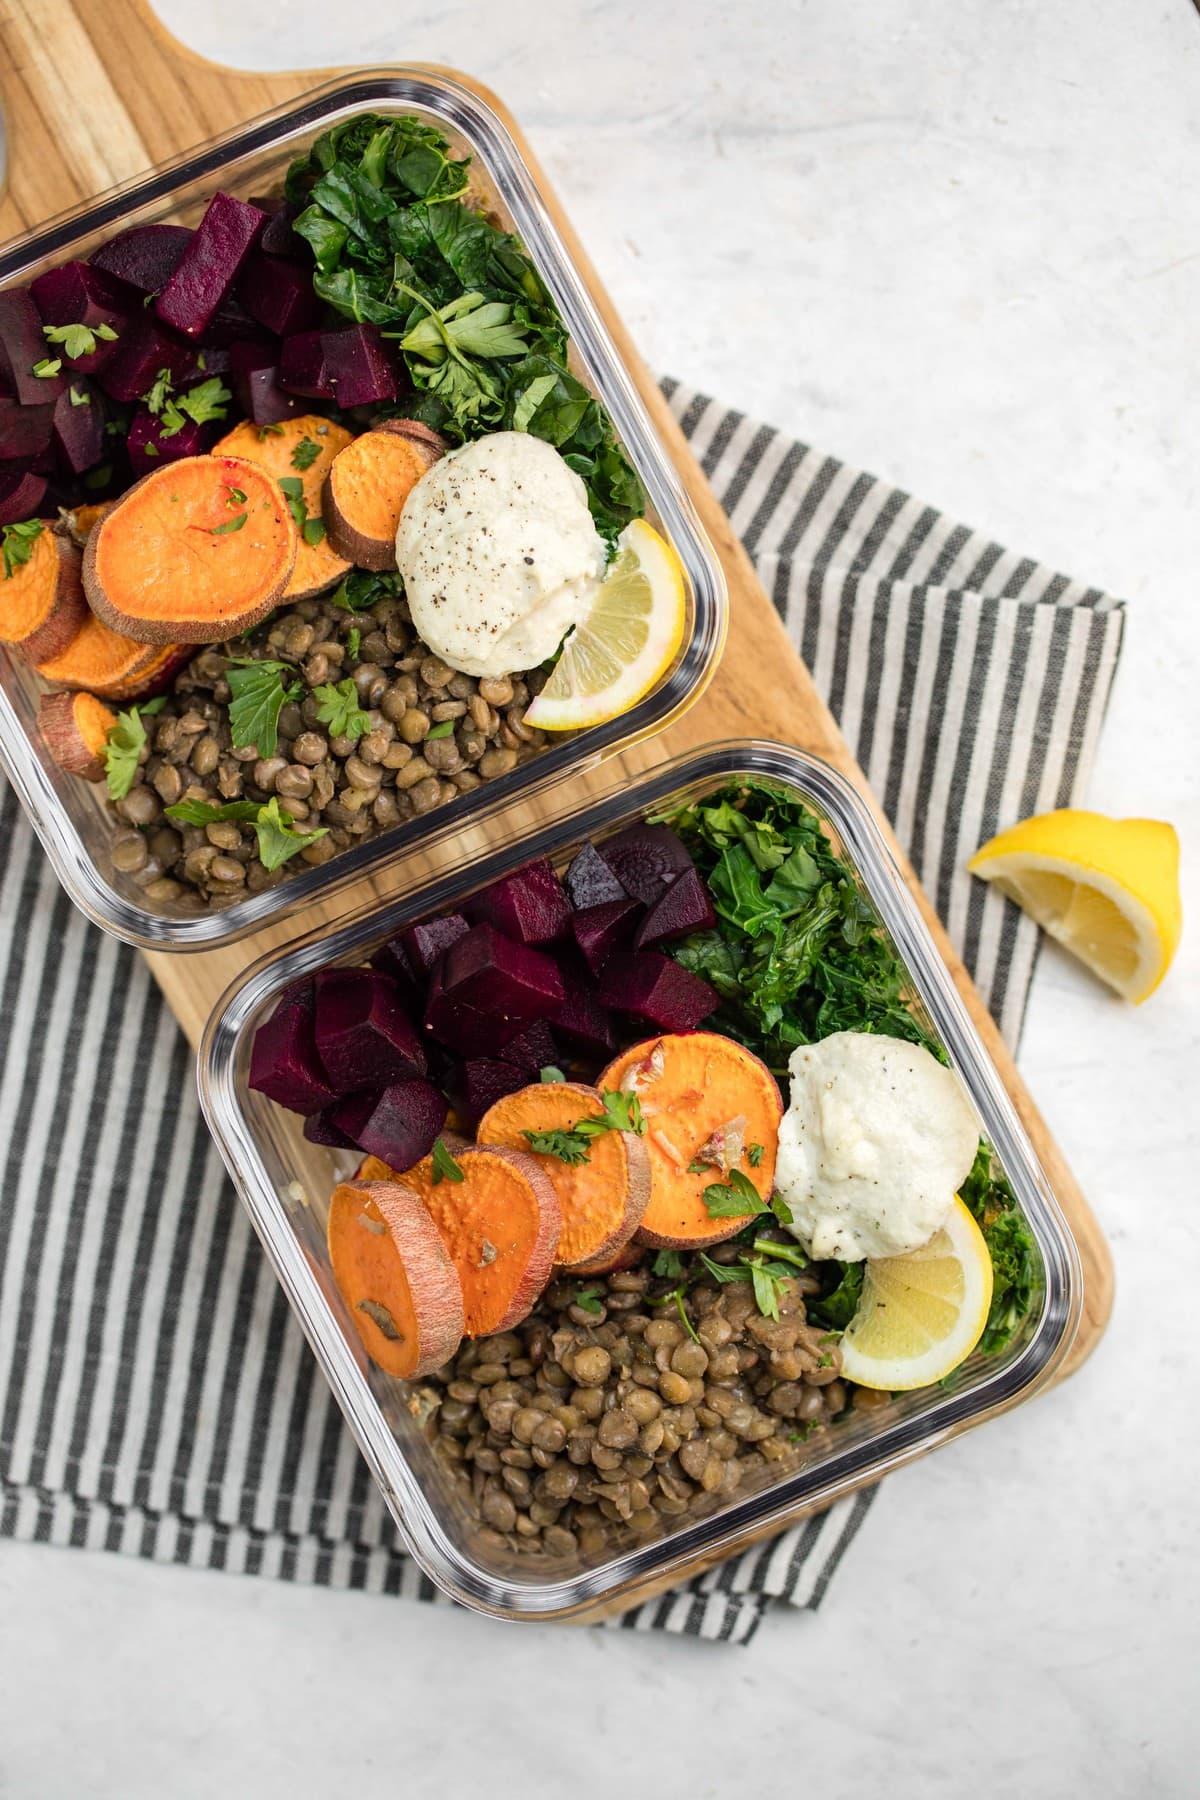 glass tupperwares filled with warm lentil salad ingredients for meal prep